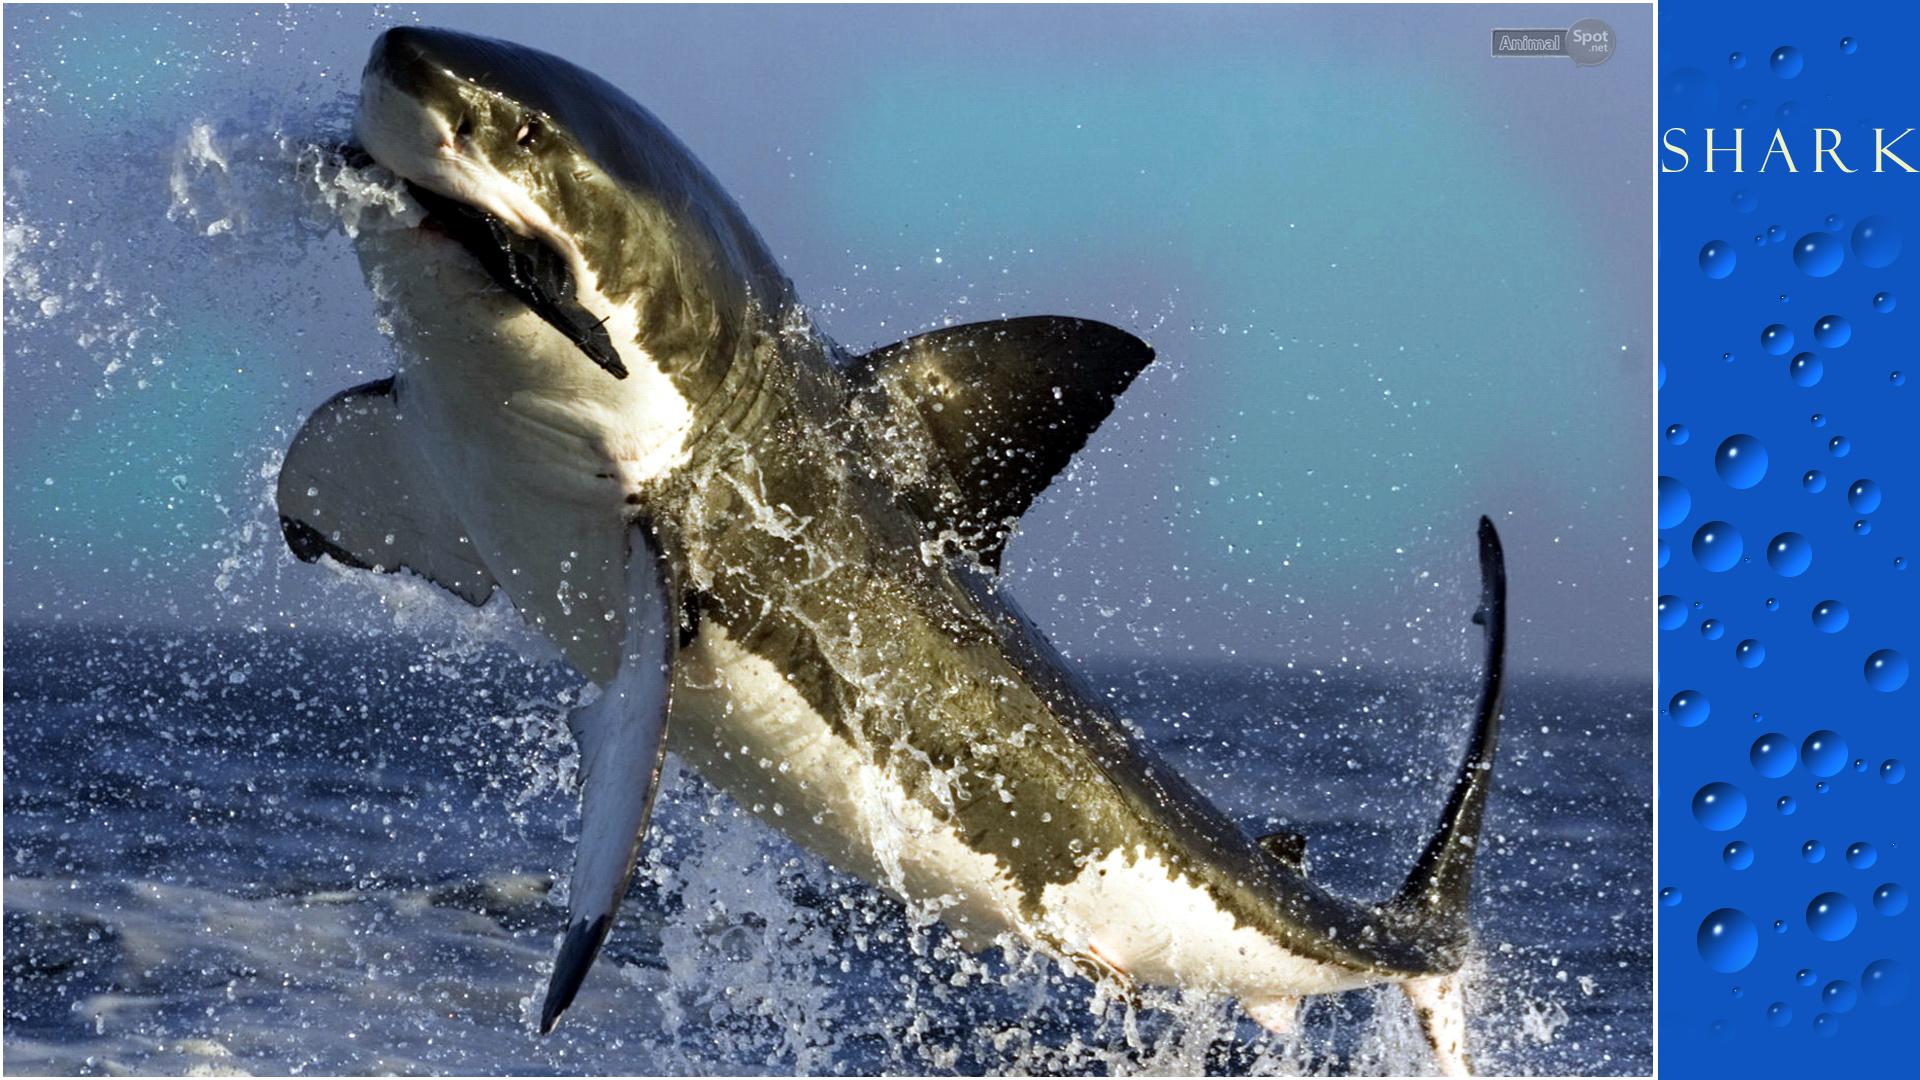 Shark Wallpapers Animal Spot